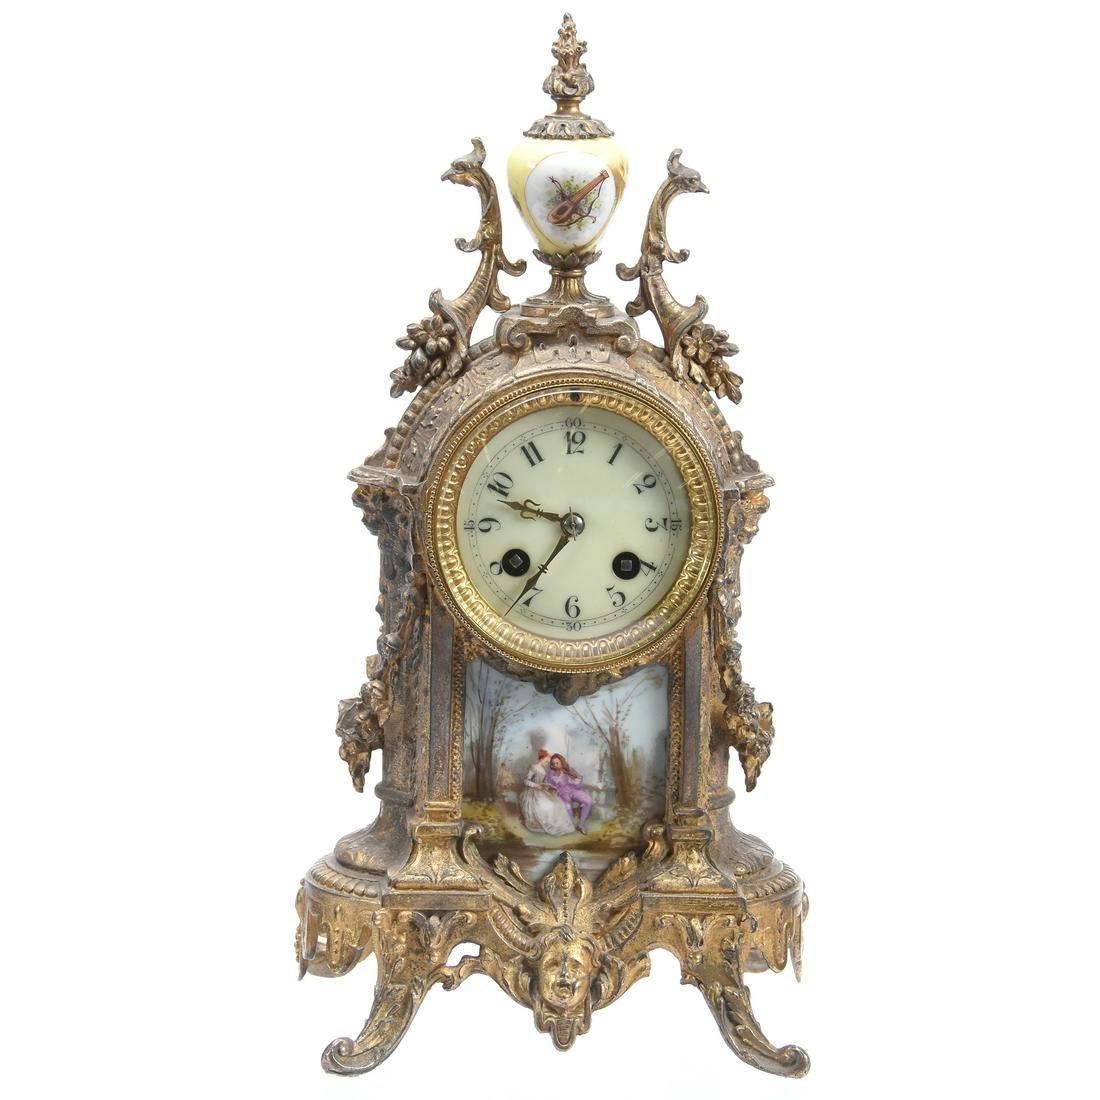 Ornate French Brass Mantel Clock